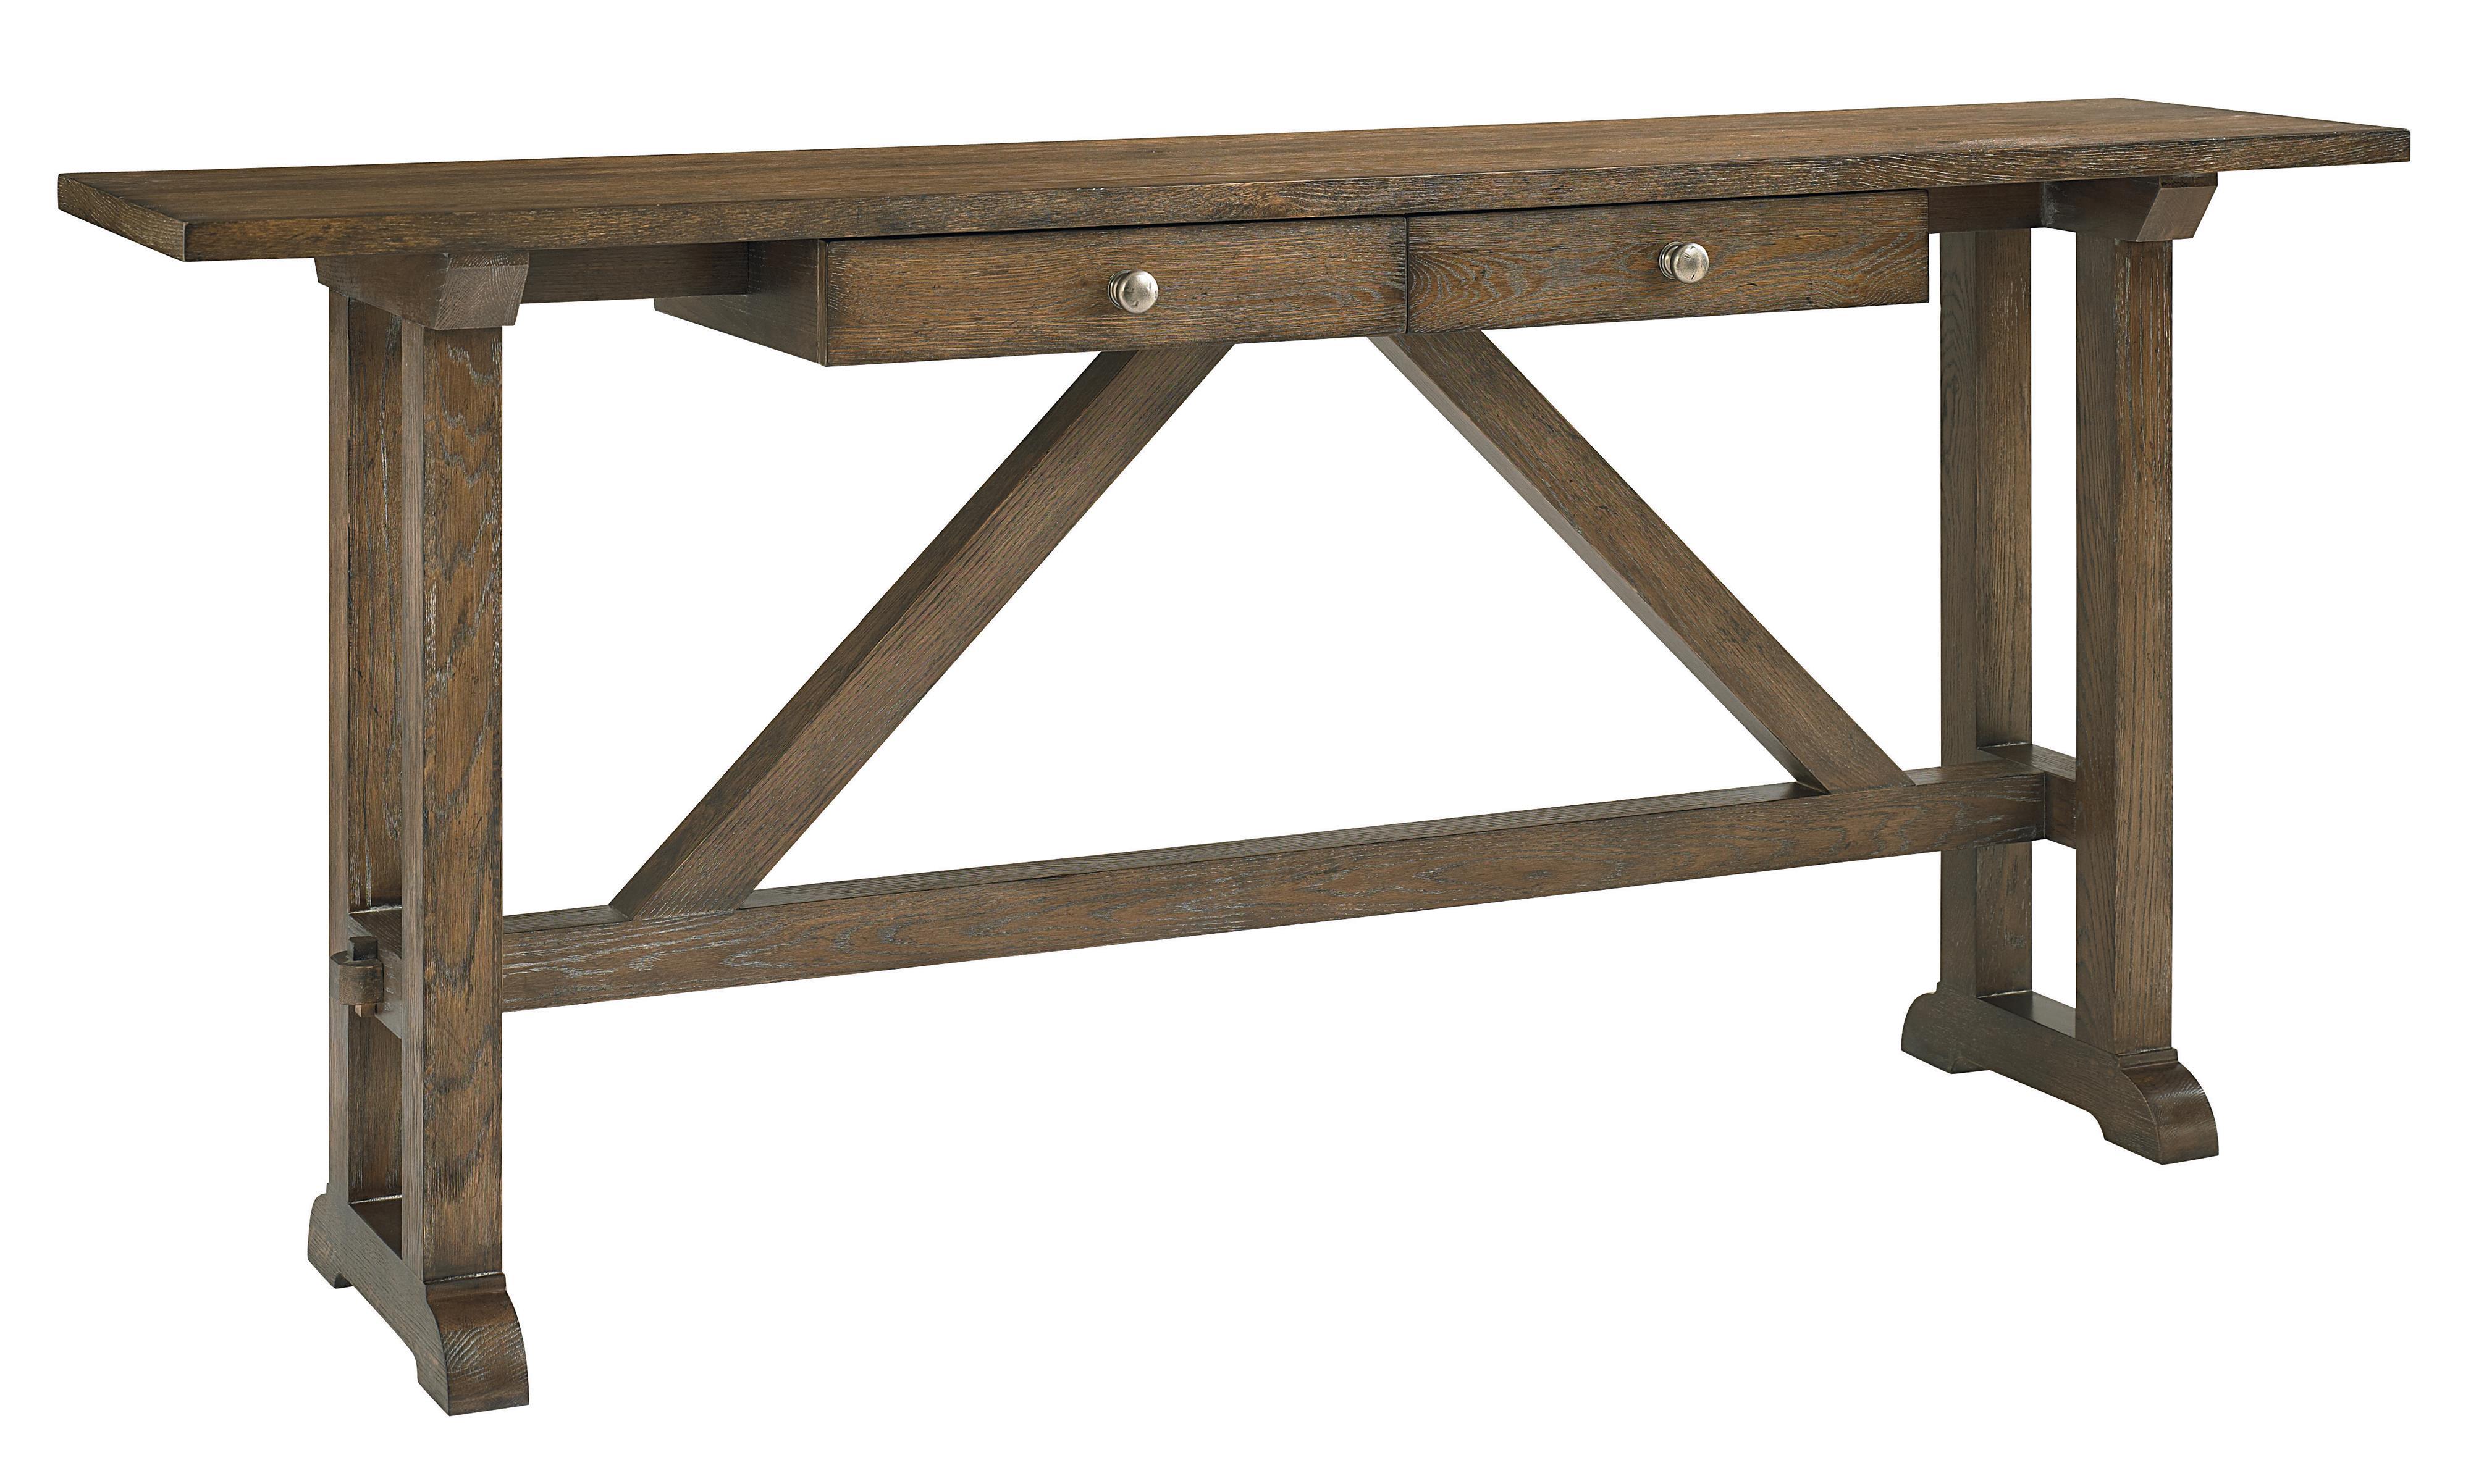 Bassett compass 6525 0698 console table john v schultz for Sofa table vs console table